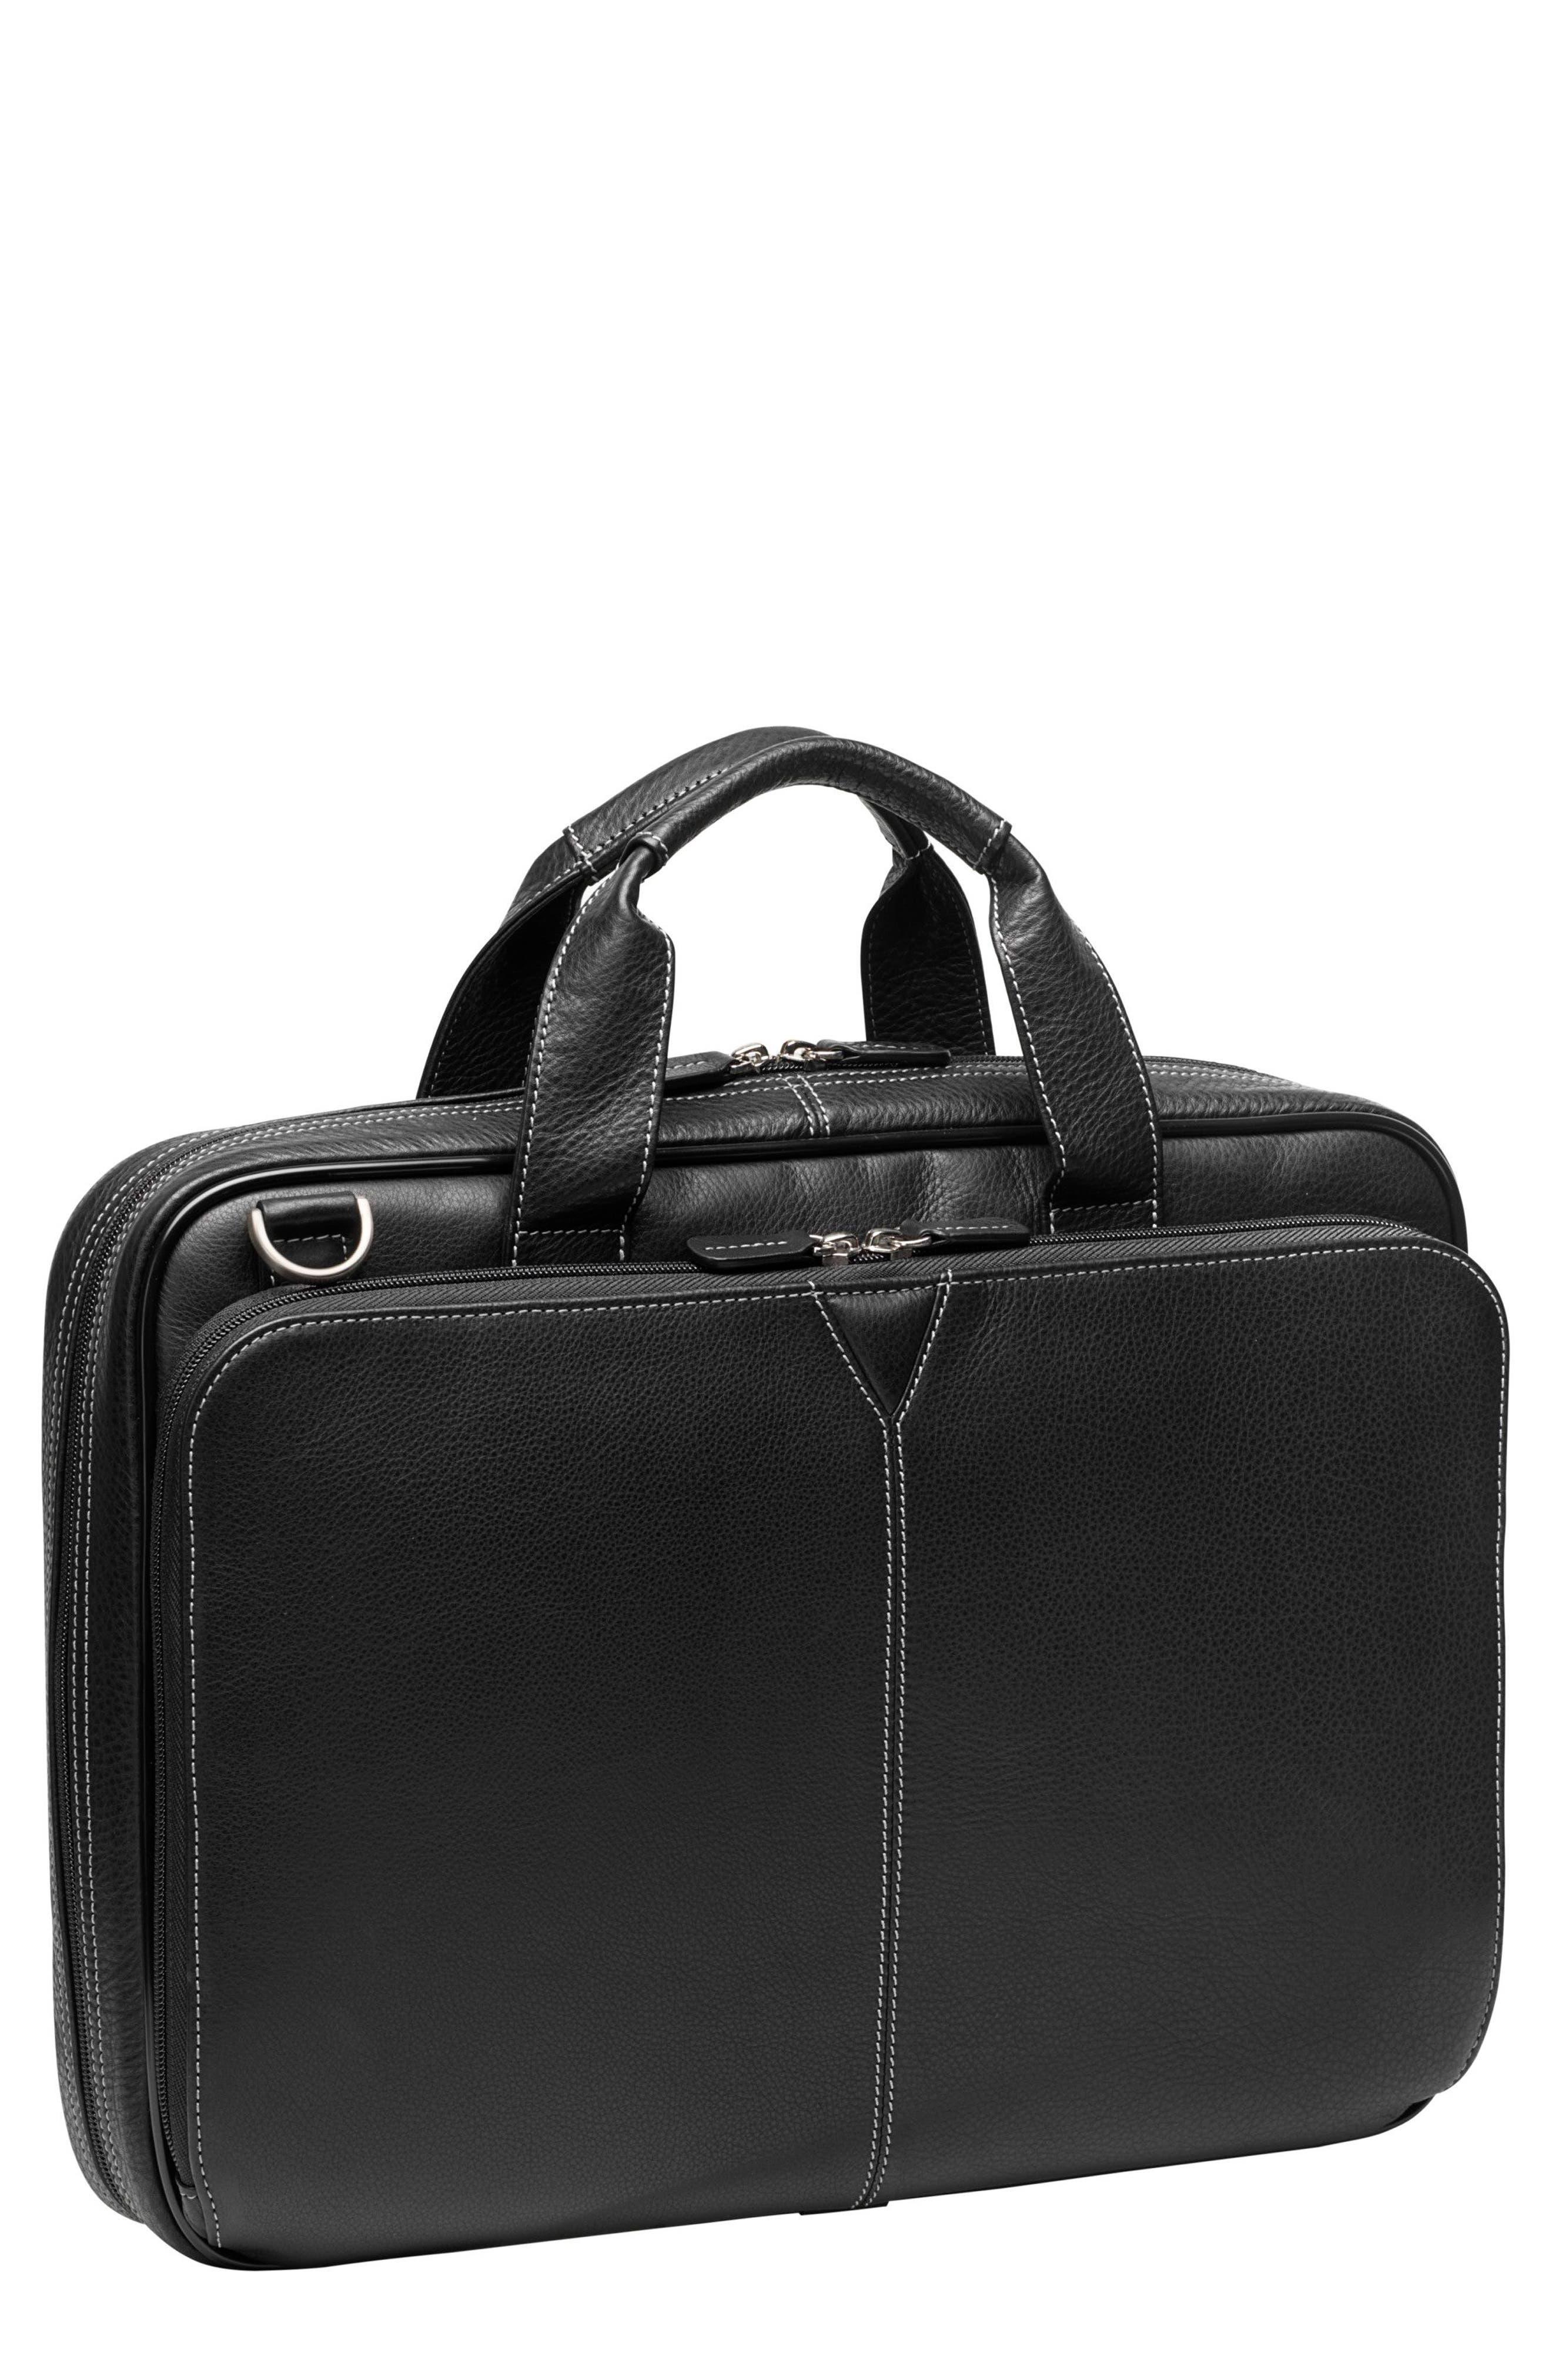 Leather Briefcase,                             Main thumbnail 1, color,                             BLACK